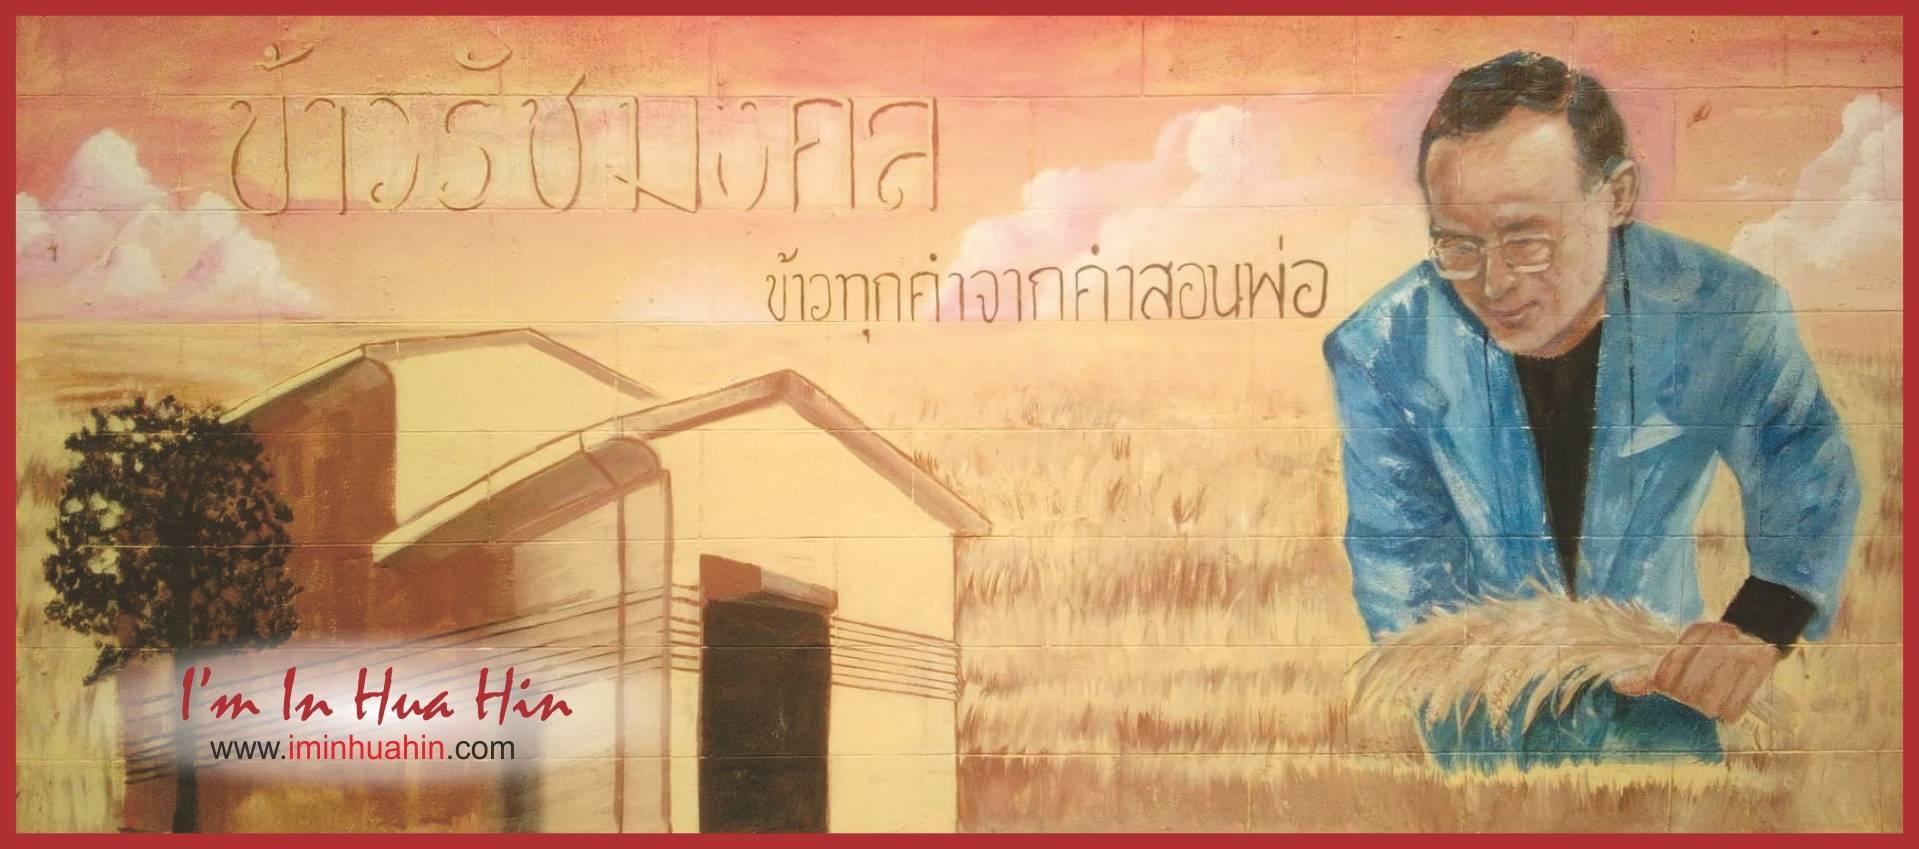 beautiful and inspiring painting of HM King Bhumibol Adulyadej, Rama IX of the Chakri Dynasty